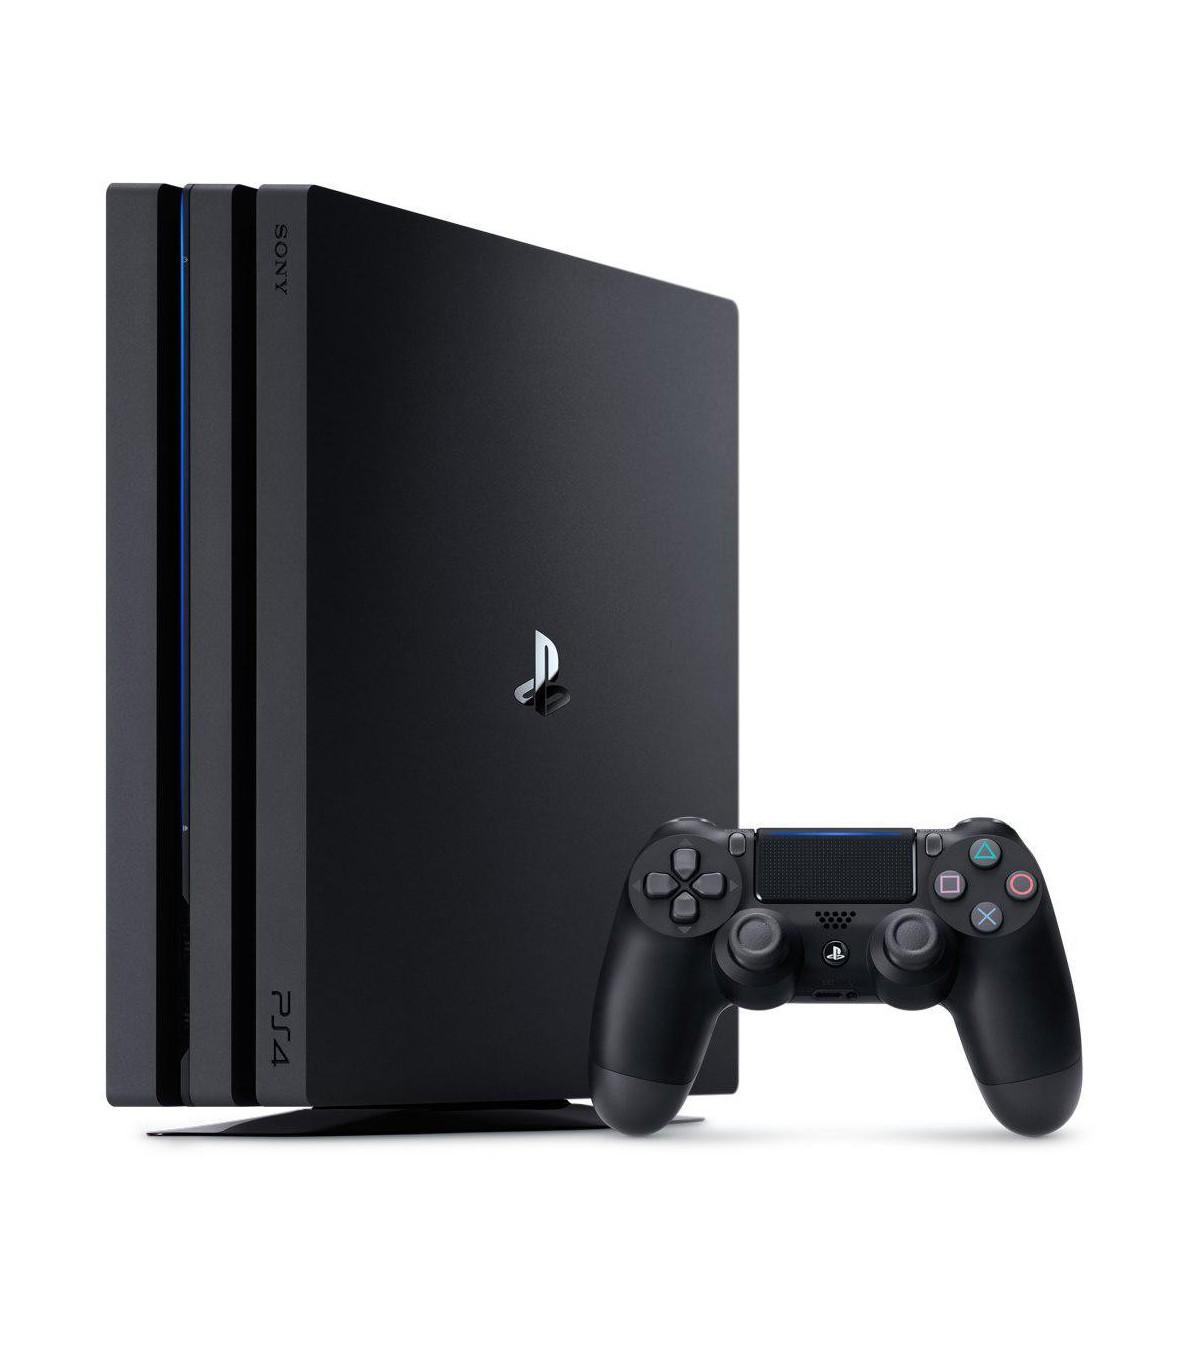 Playstation 4 Pro Region 2 - 1TB